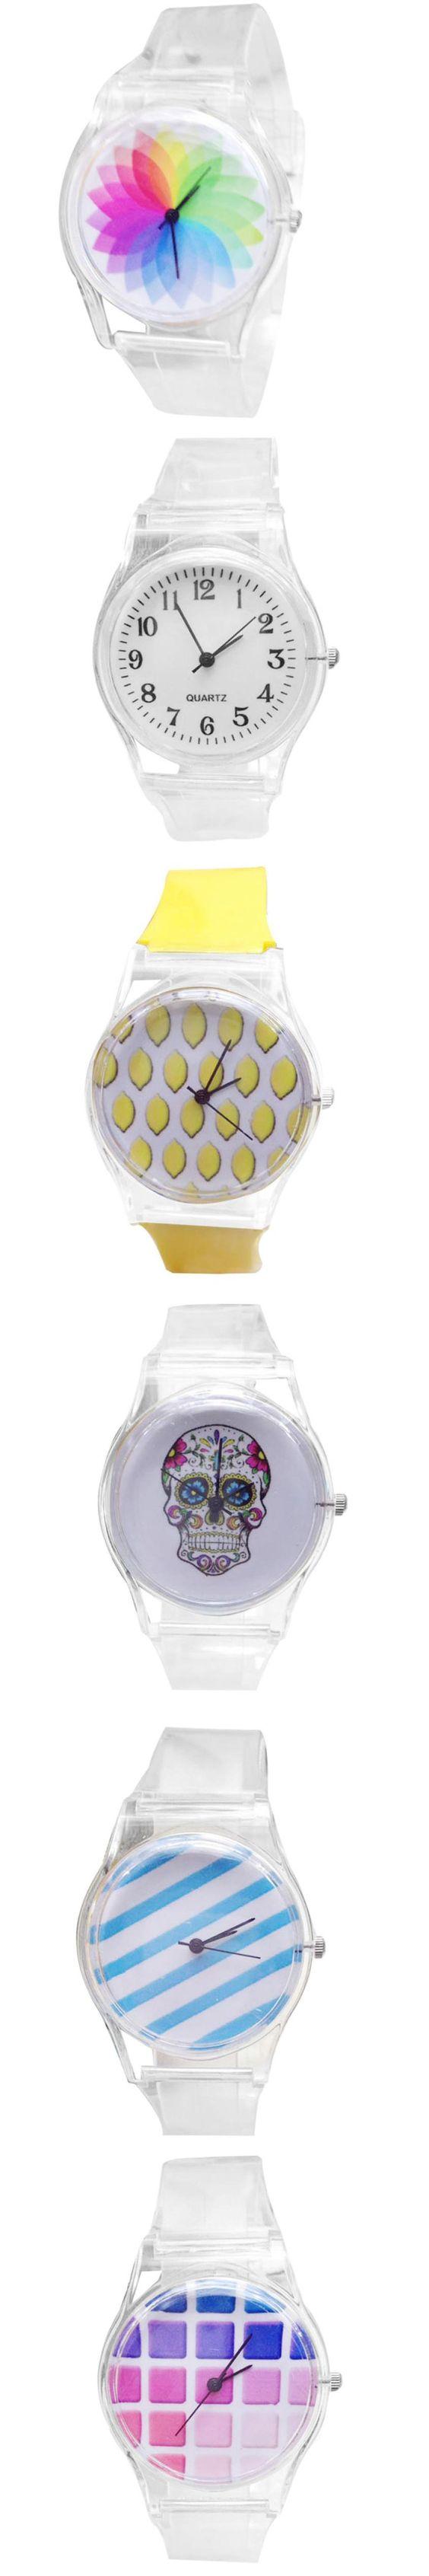 Kids Watches Lovely Watch Children Students Watch Girls Watches Wristwatch Simple Wristwatches